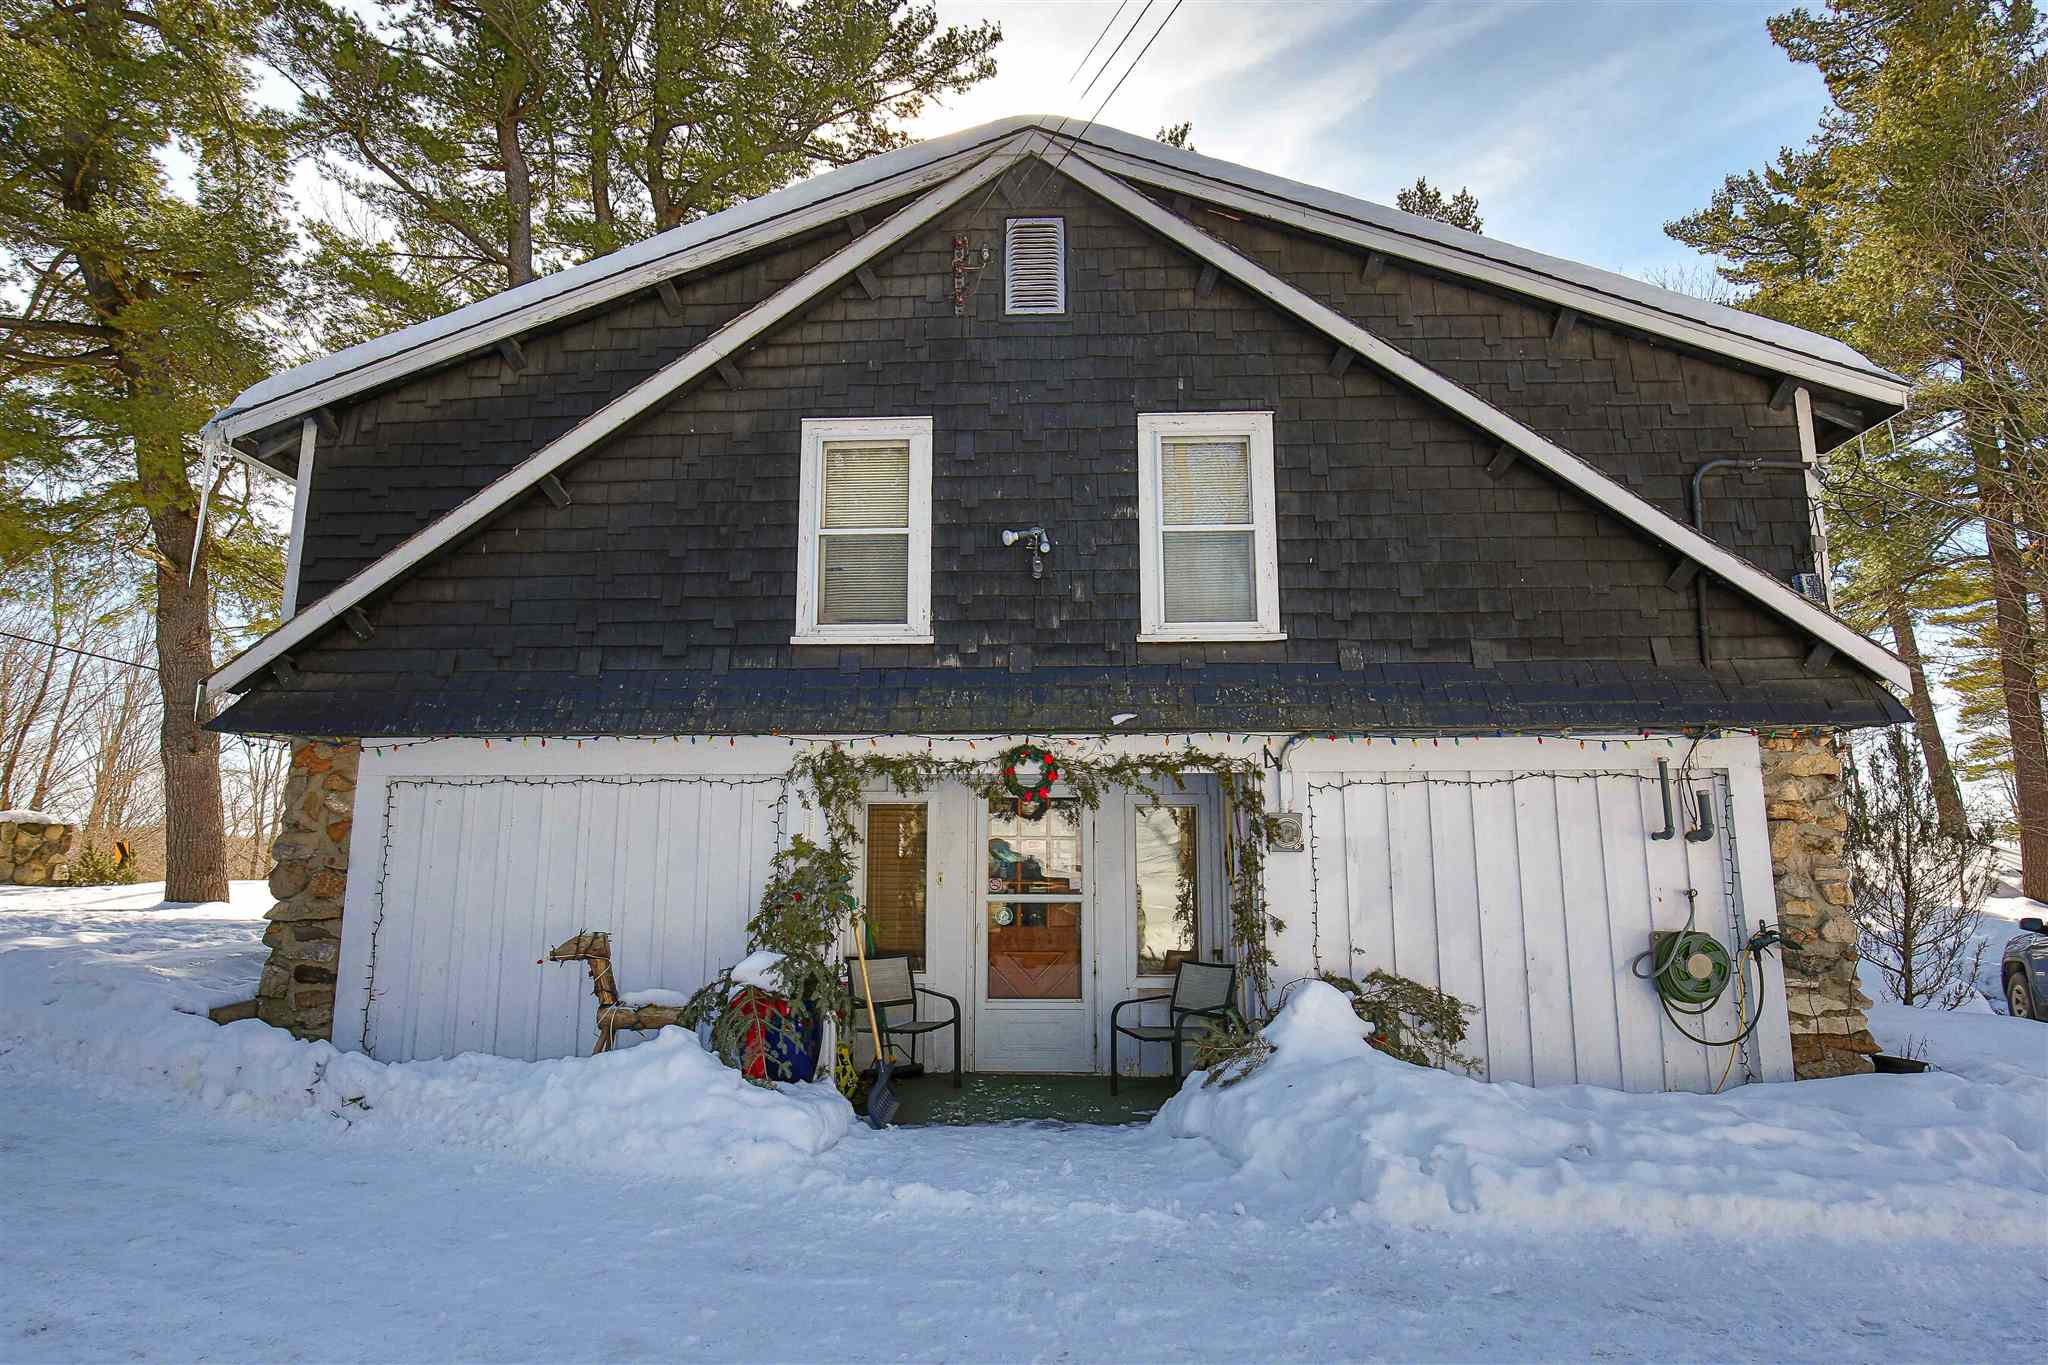 2585 Bolingbroke Road, Tay Valley Township, Ontario (ID K21001120)